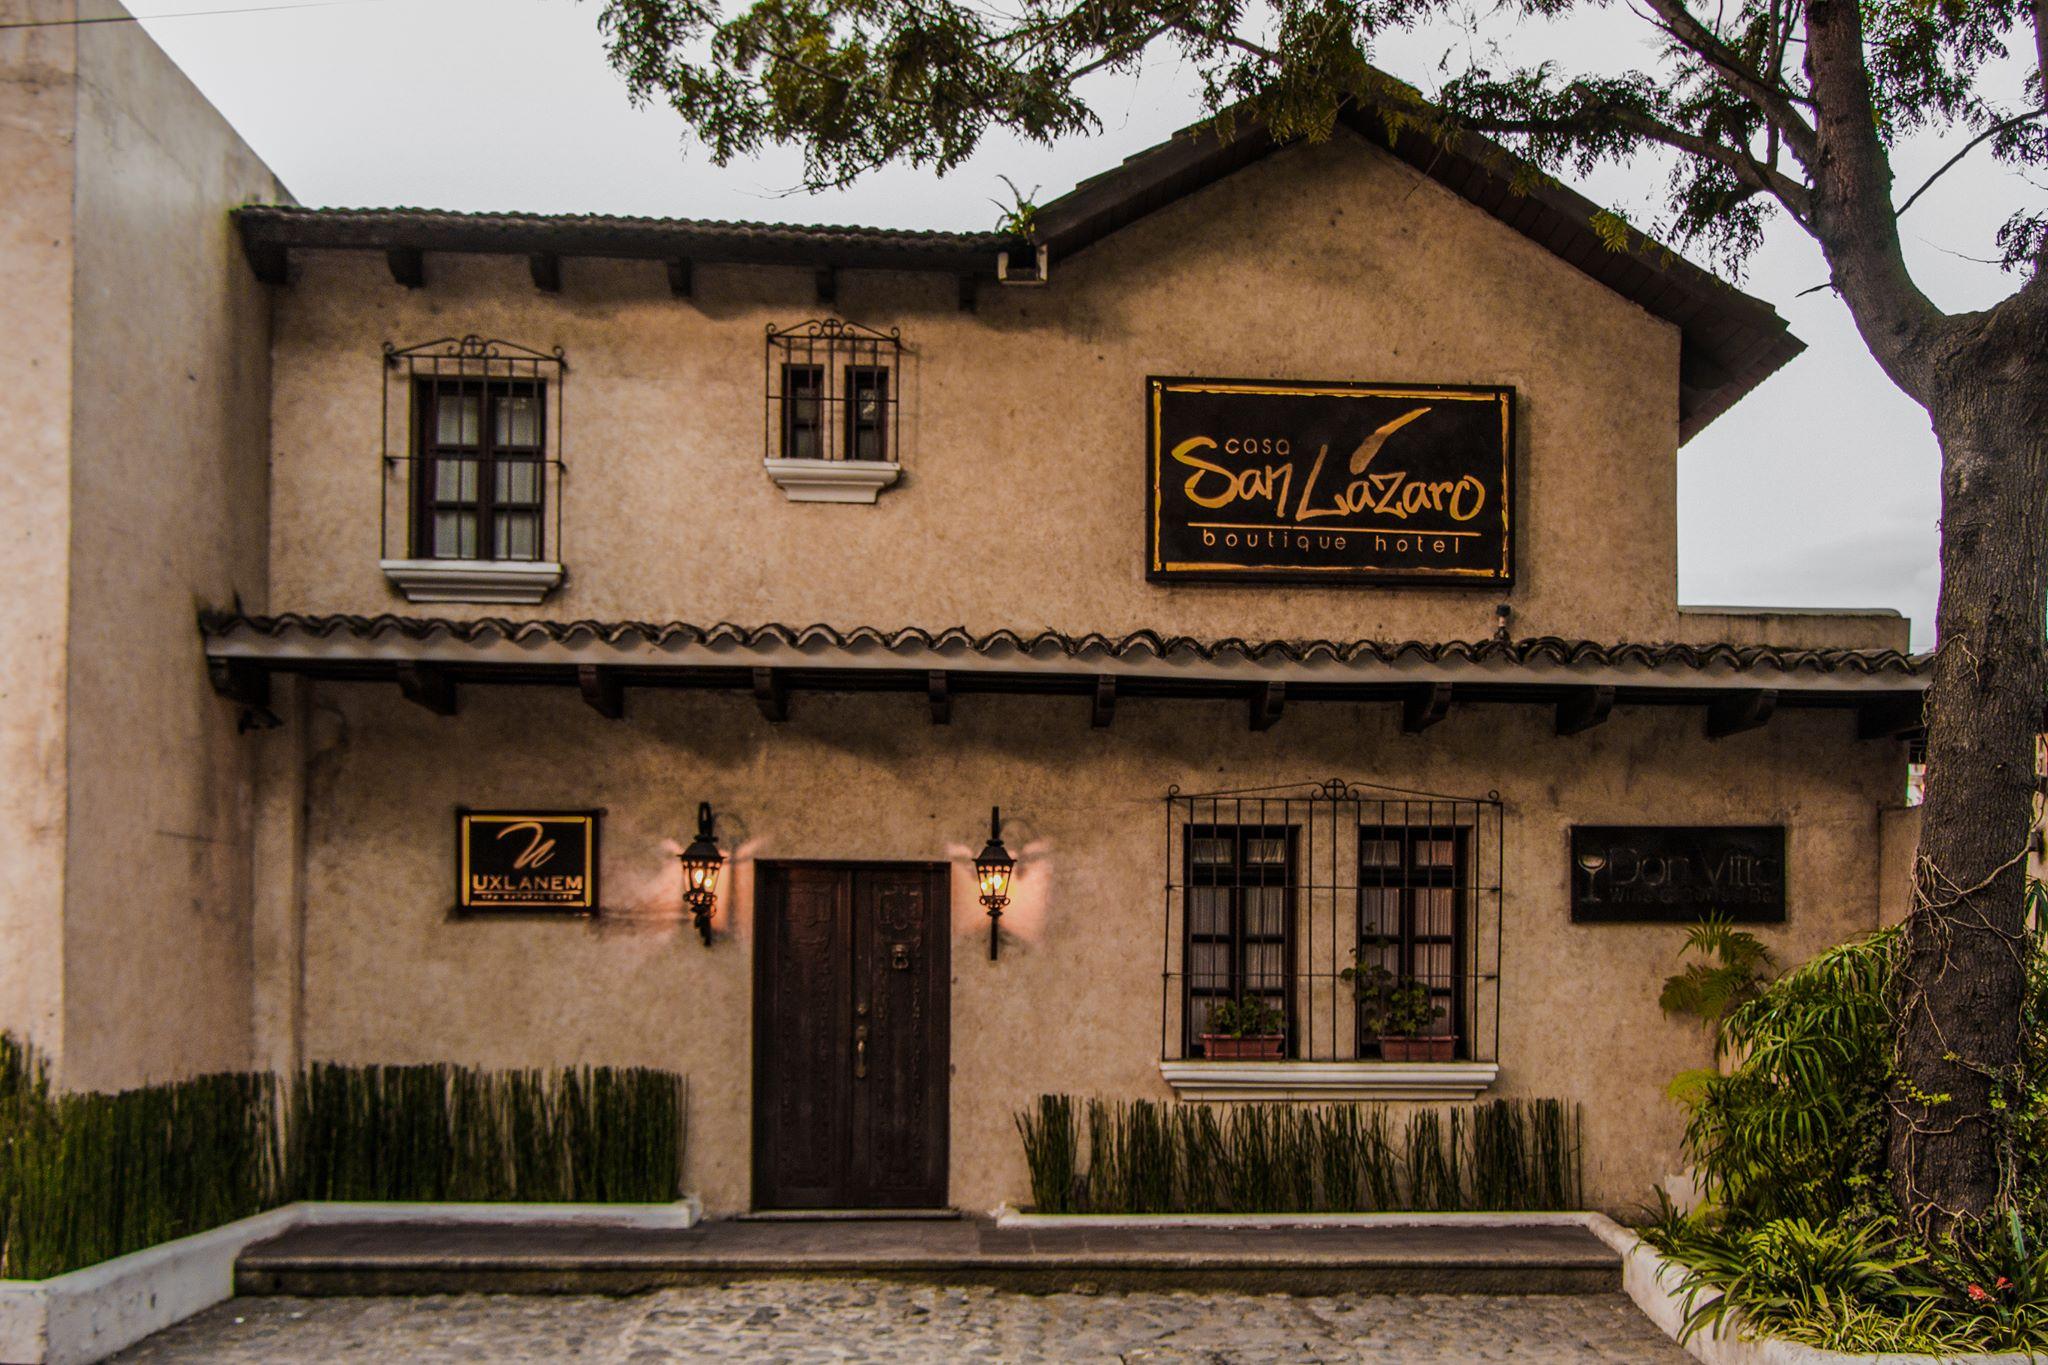 Casa San Lazaro Boutique Hotel